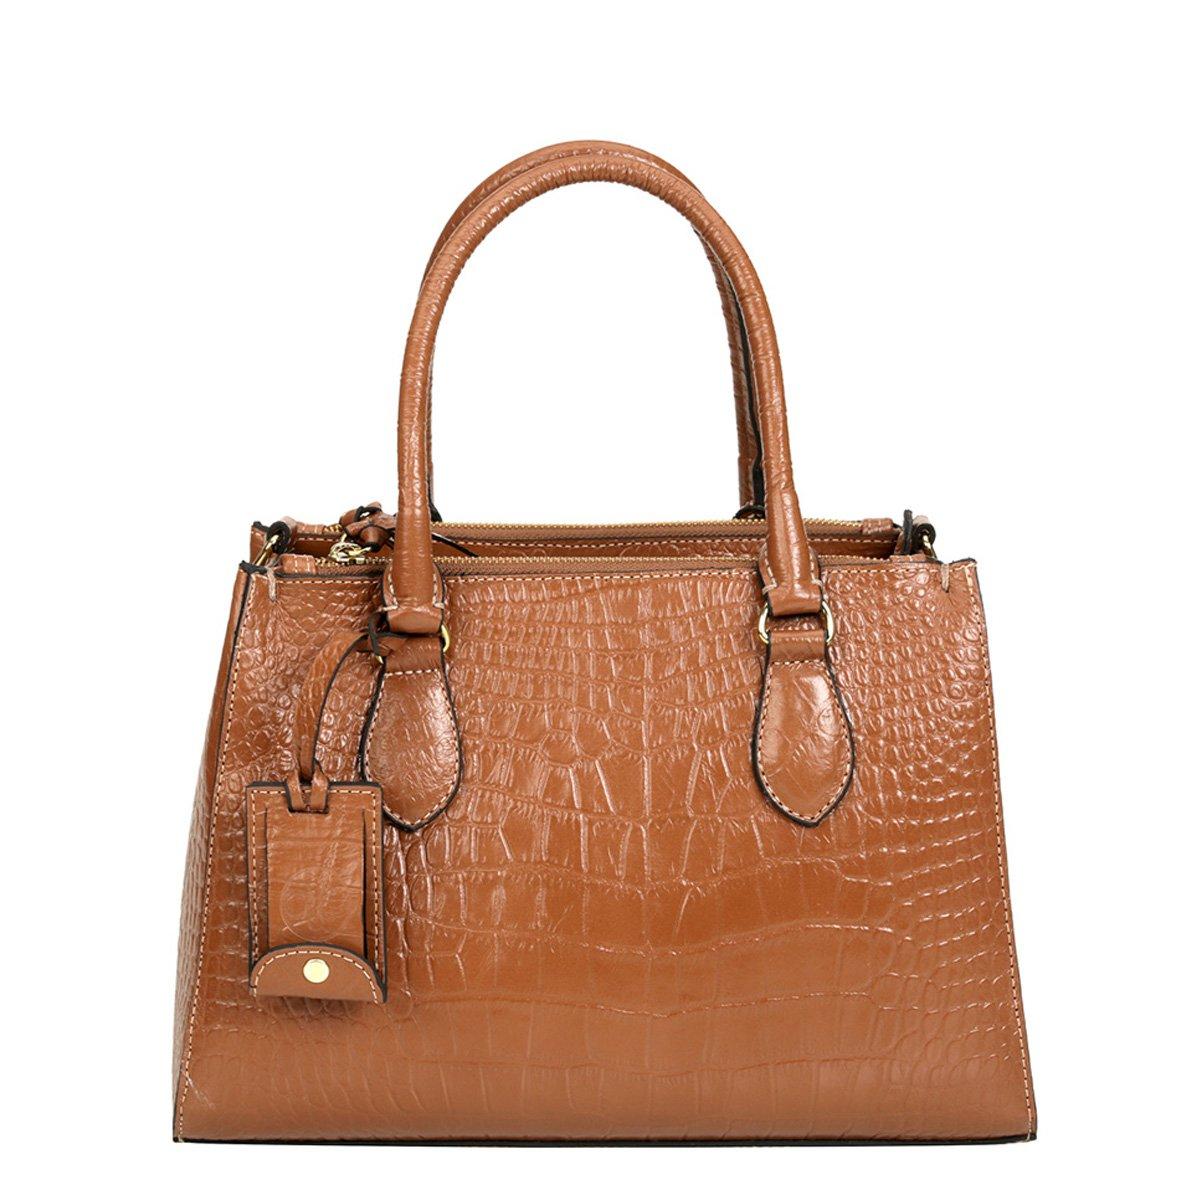 07adcc272b Bolsa Couro Shoestock Satchel Croco Feminina - Compre Agora